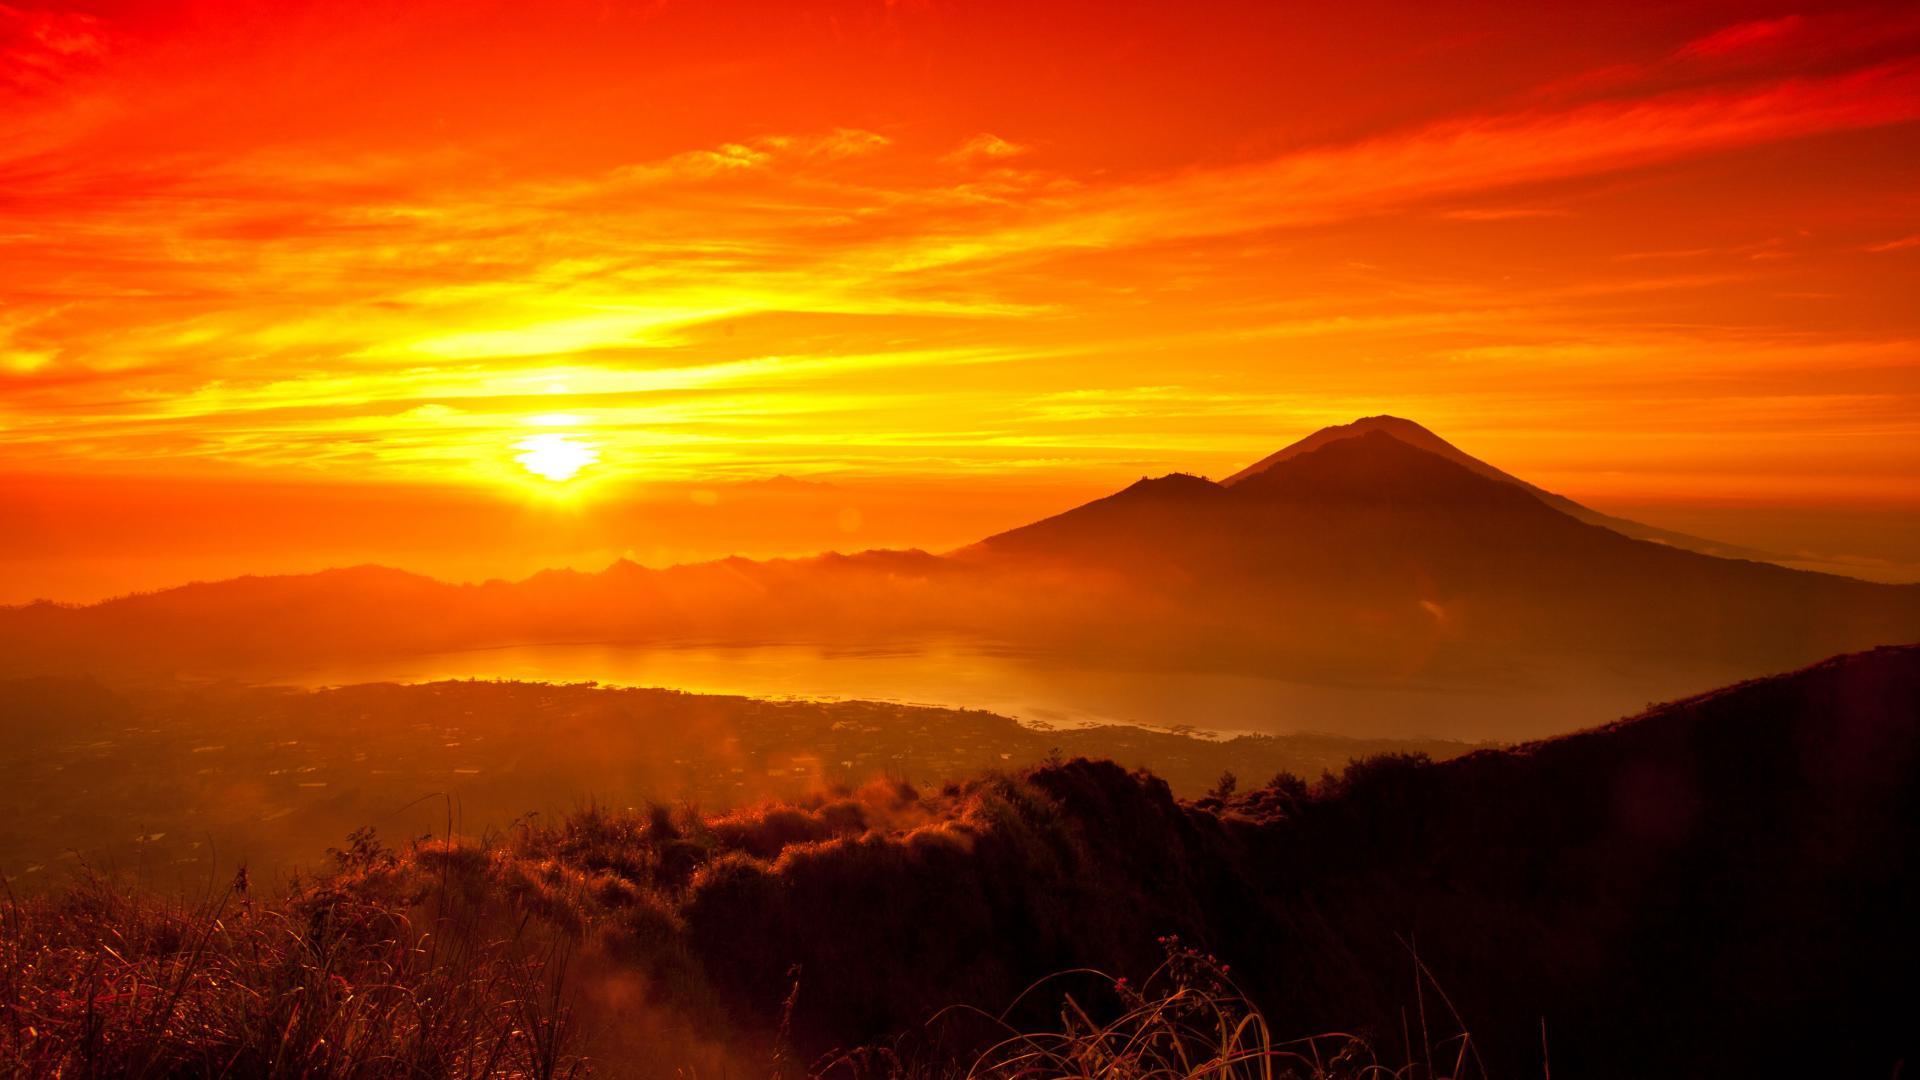 Nature Sunrise Sunset Indonesia Bali Landscape Indonesia wallpaper 1920x1080